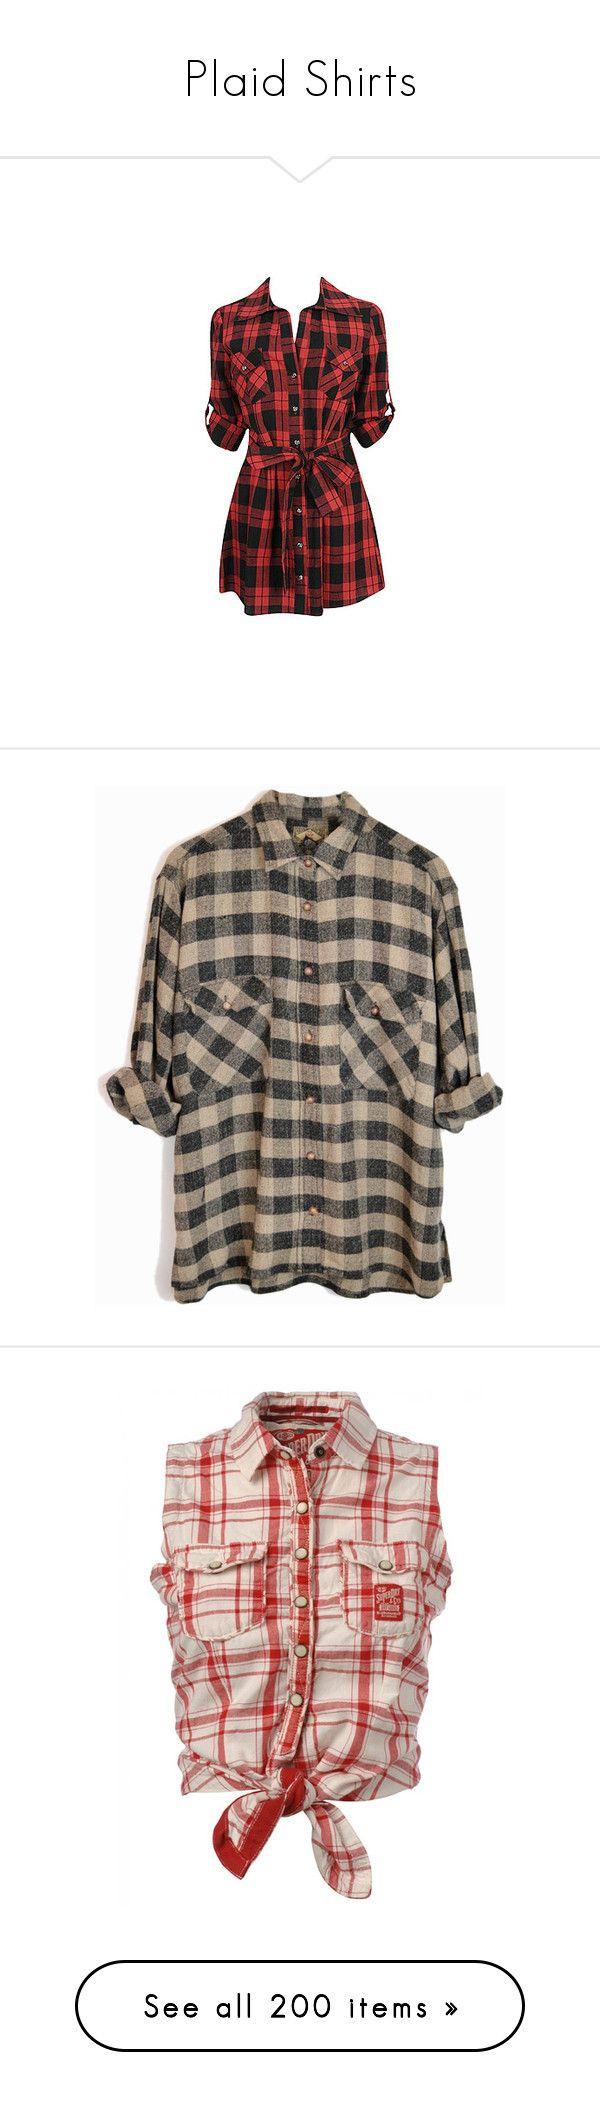 """Plaid Shirts"" by chell-p ❤ liked on Polyvore featuring plaid, shirts, tops, tunics, dresses, vestidos, blusas, plaid top, tartan shirt and red plaid shirt"